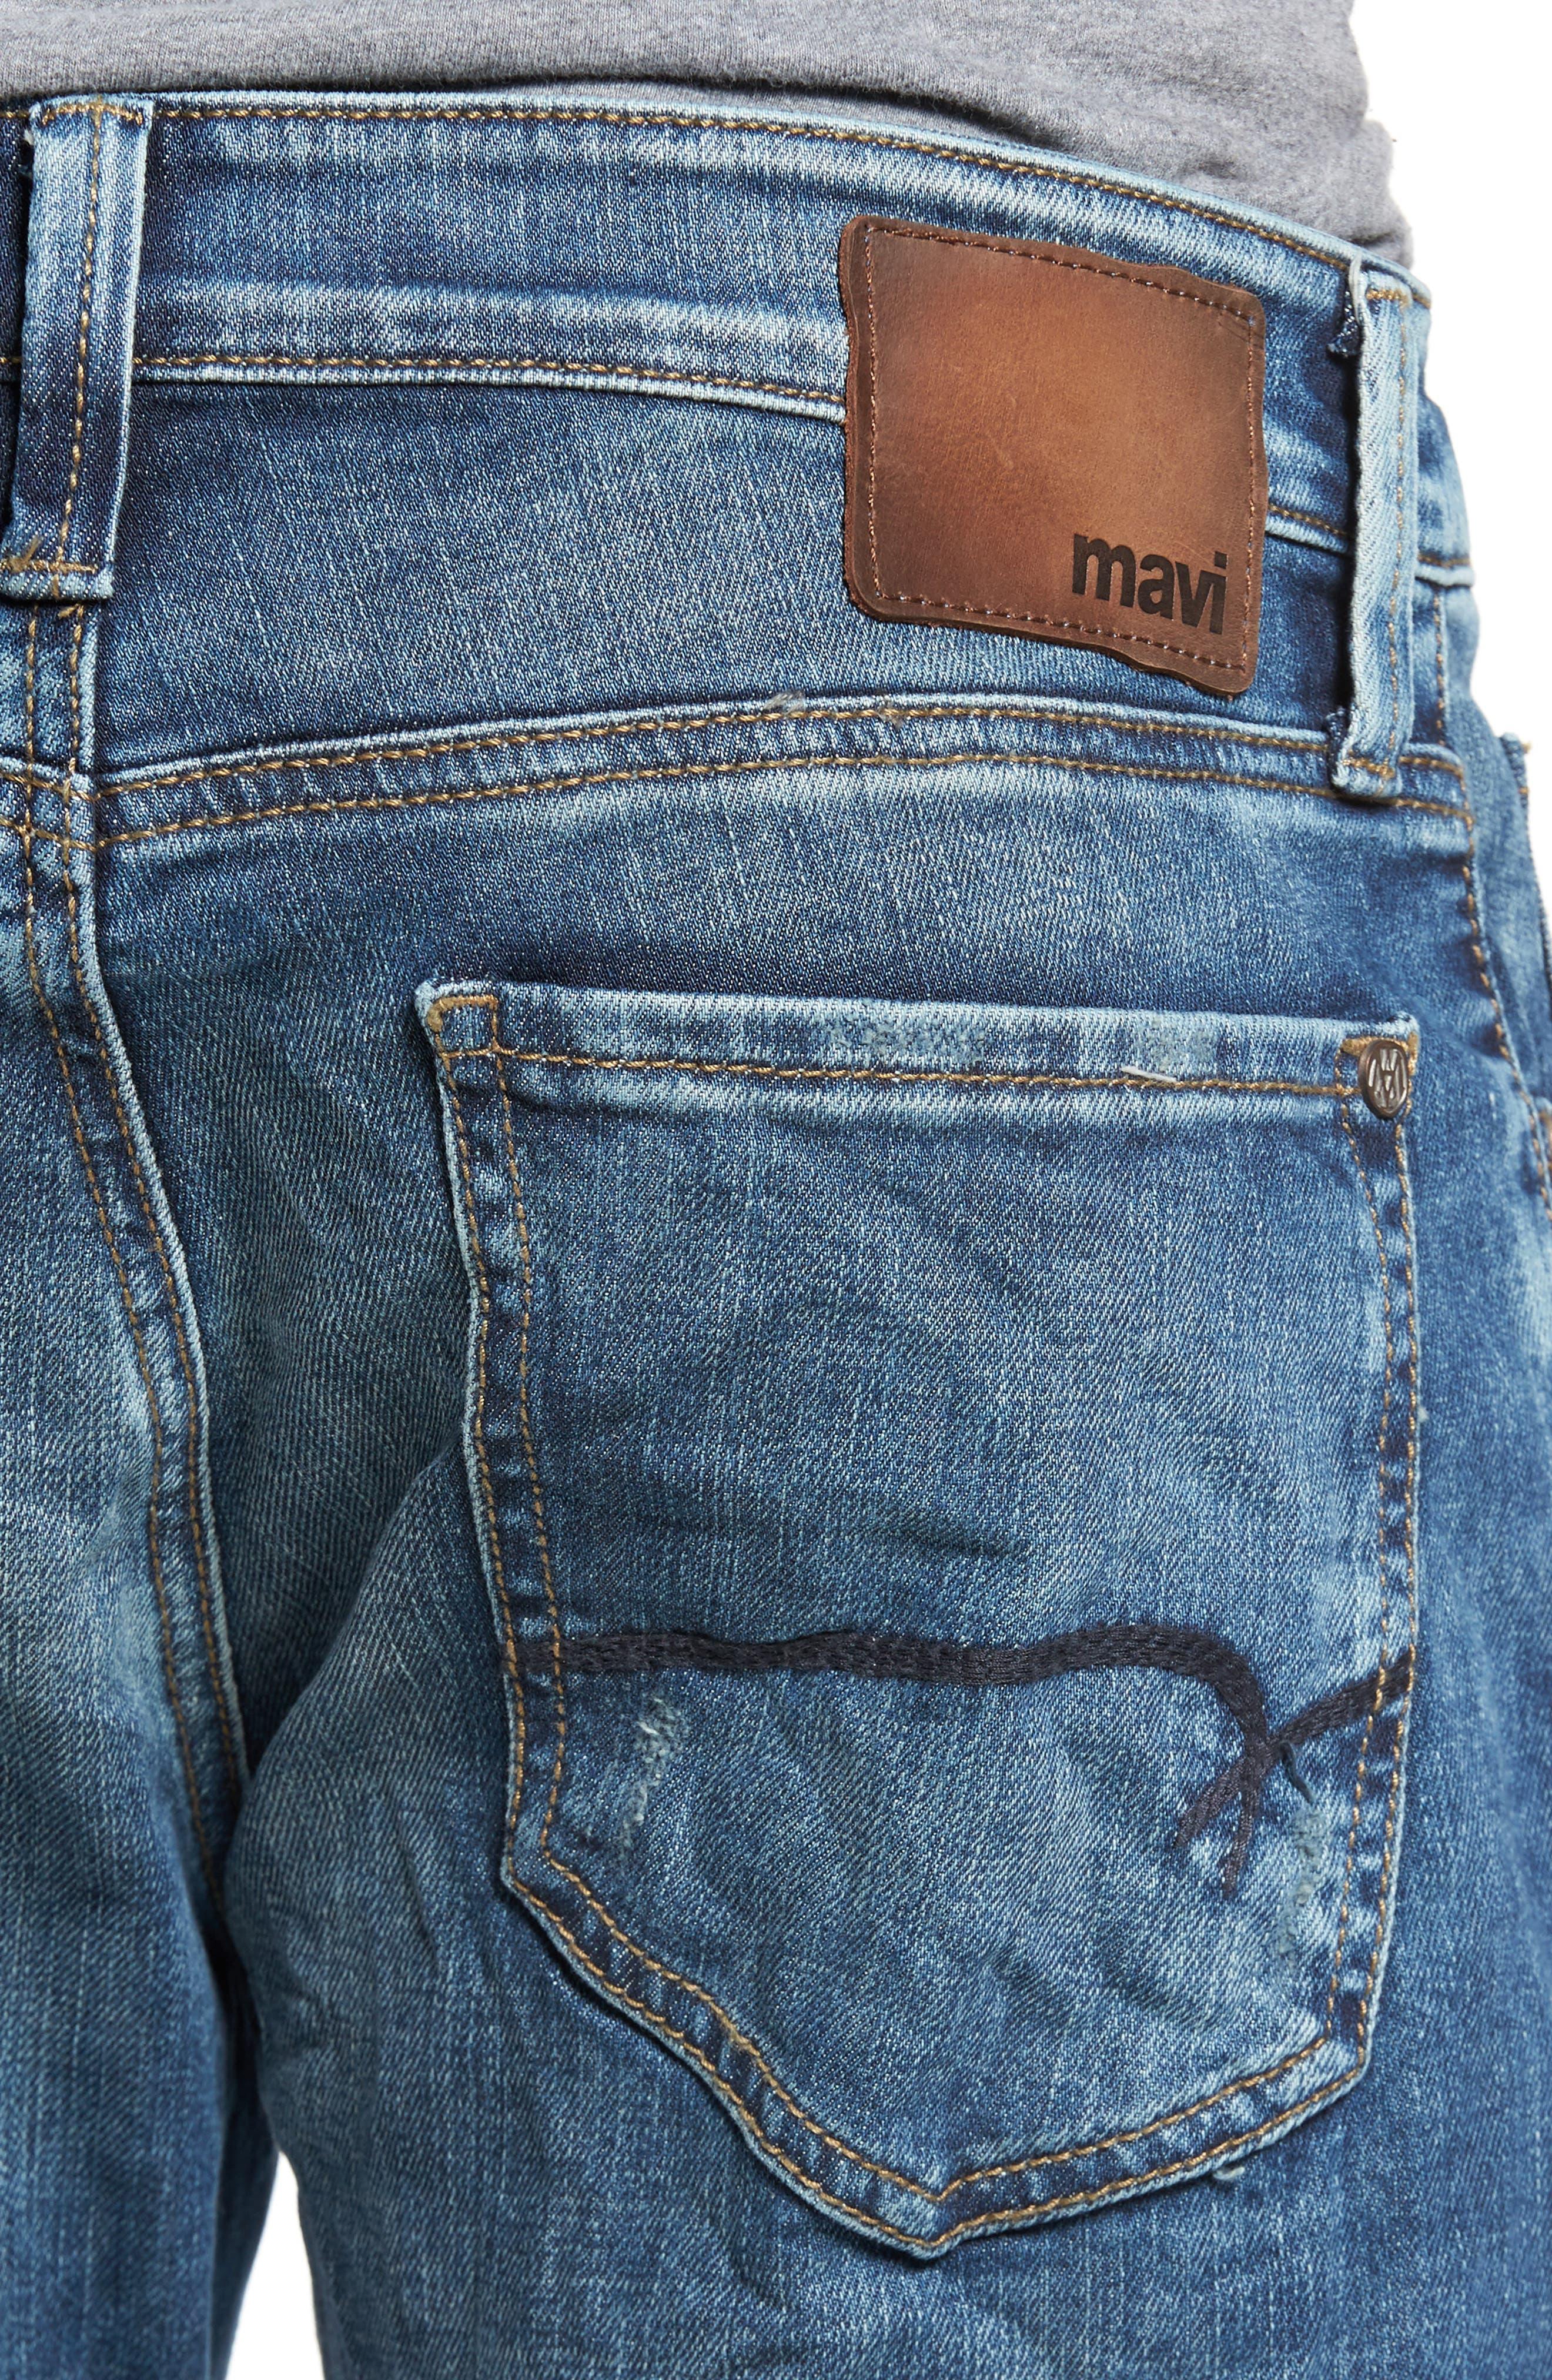 Jake Easy Slim Fit Jeans,                             Alternate thumbnail 4, color,                             Random Extreme Vintage